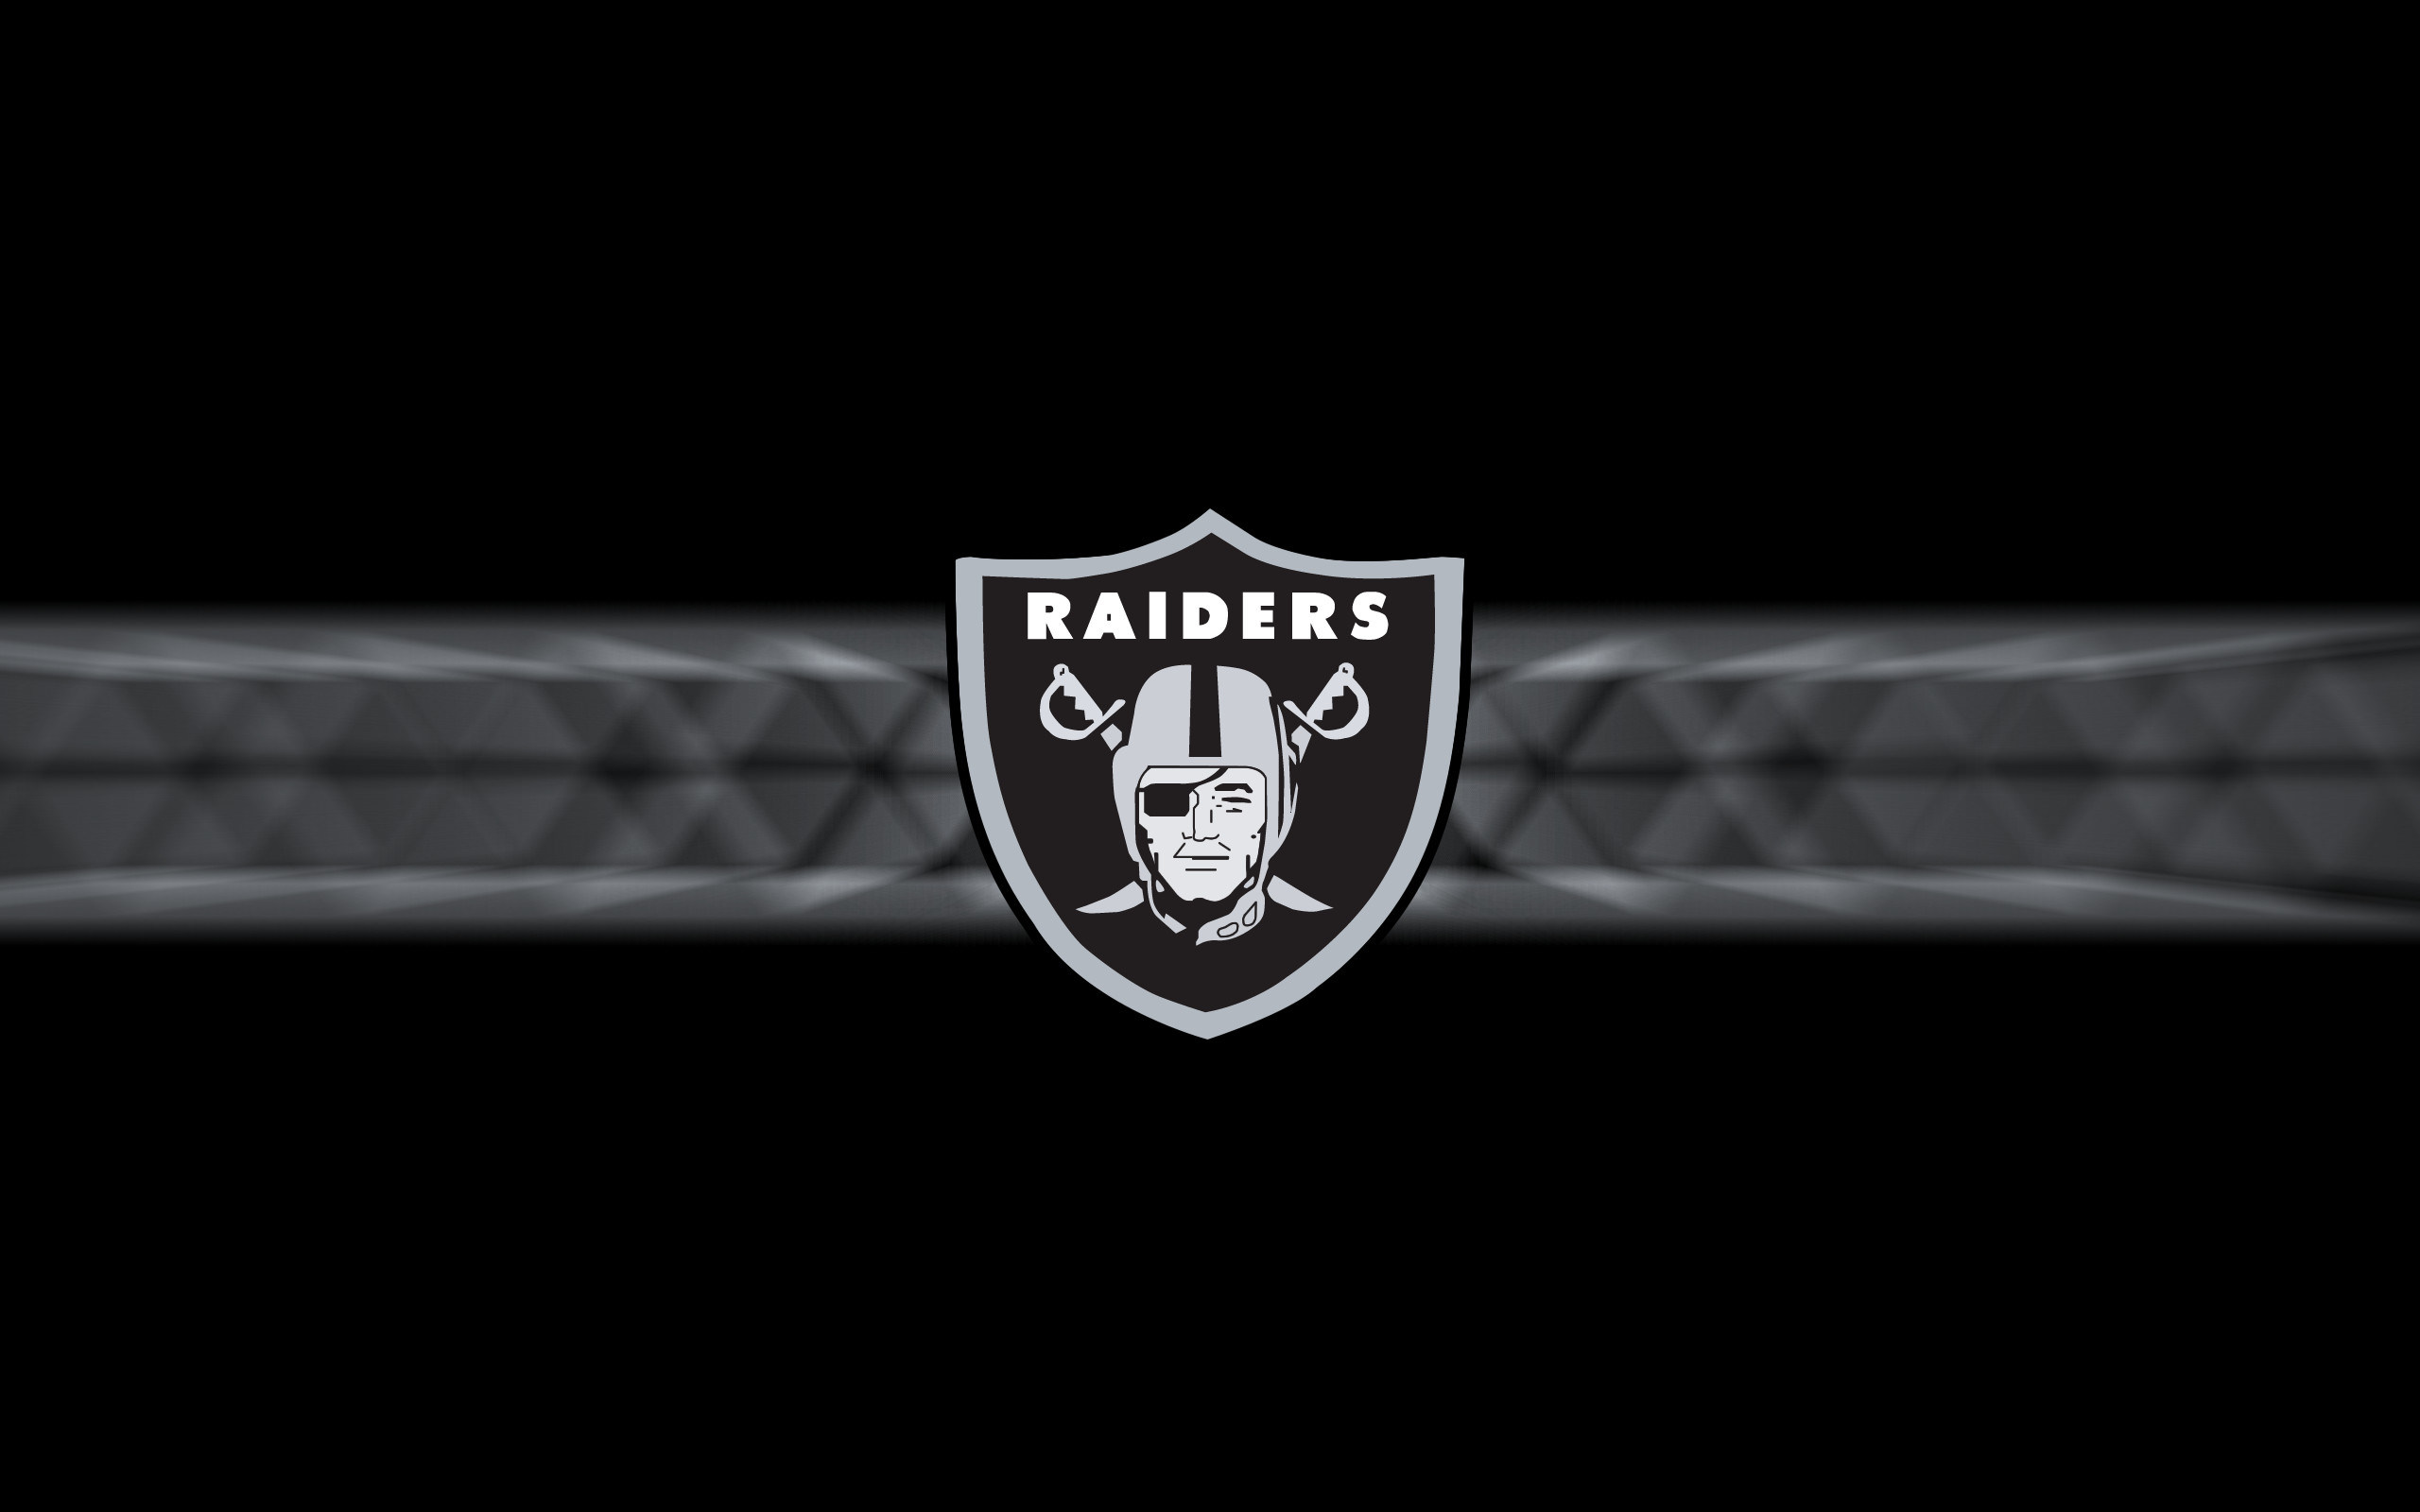 Free 3d Oakland Raiders Live Wallpaper Houston Texans Wallpaper Hd 69 Images